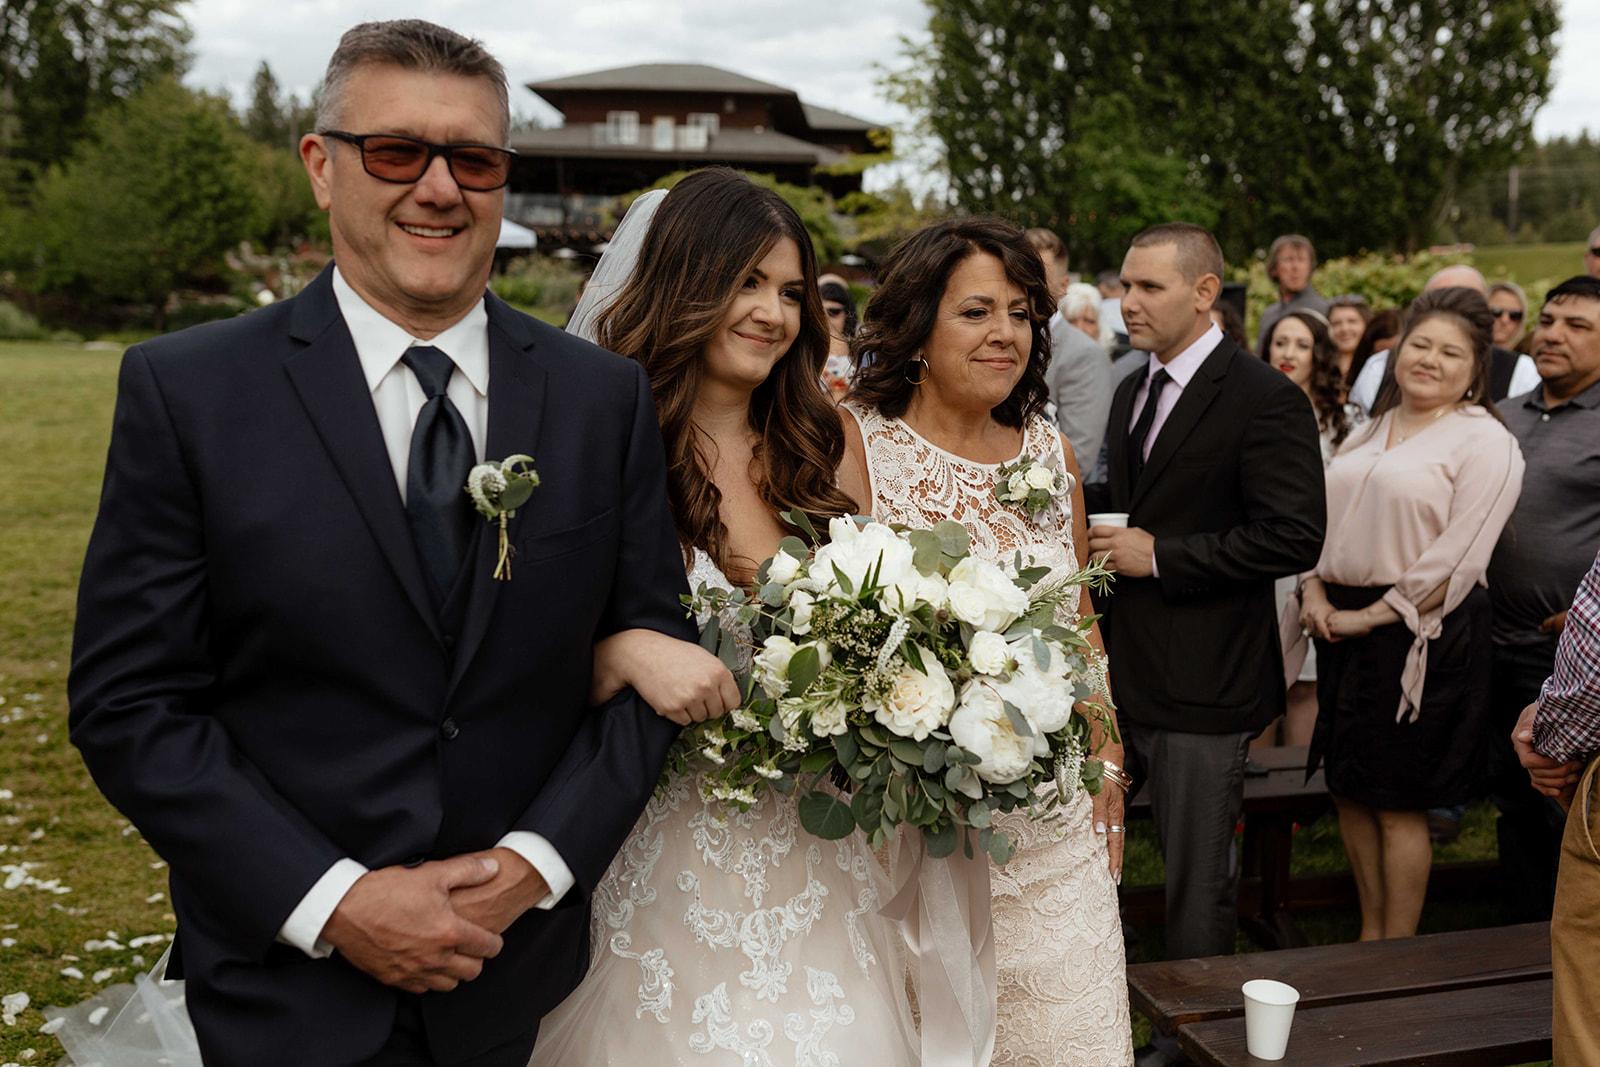 beacon hill wedding honest in ivory dress spokane aisle